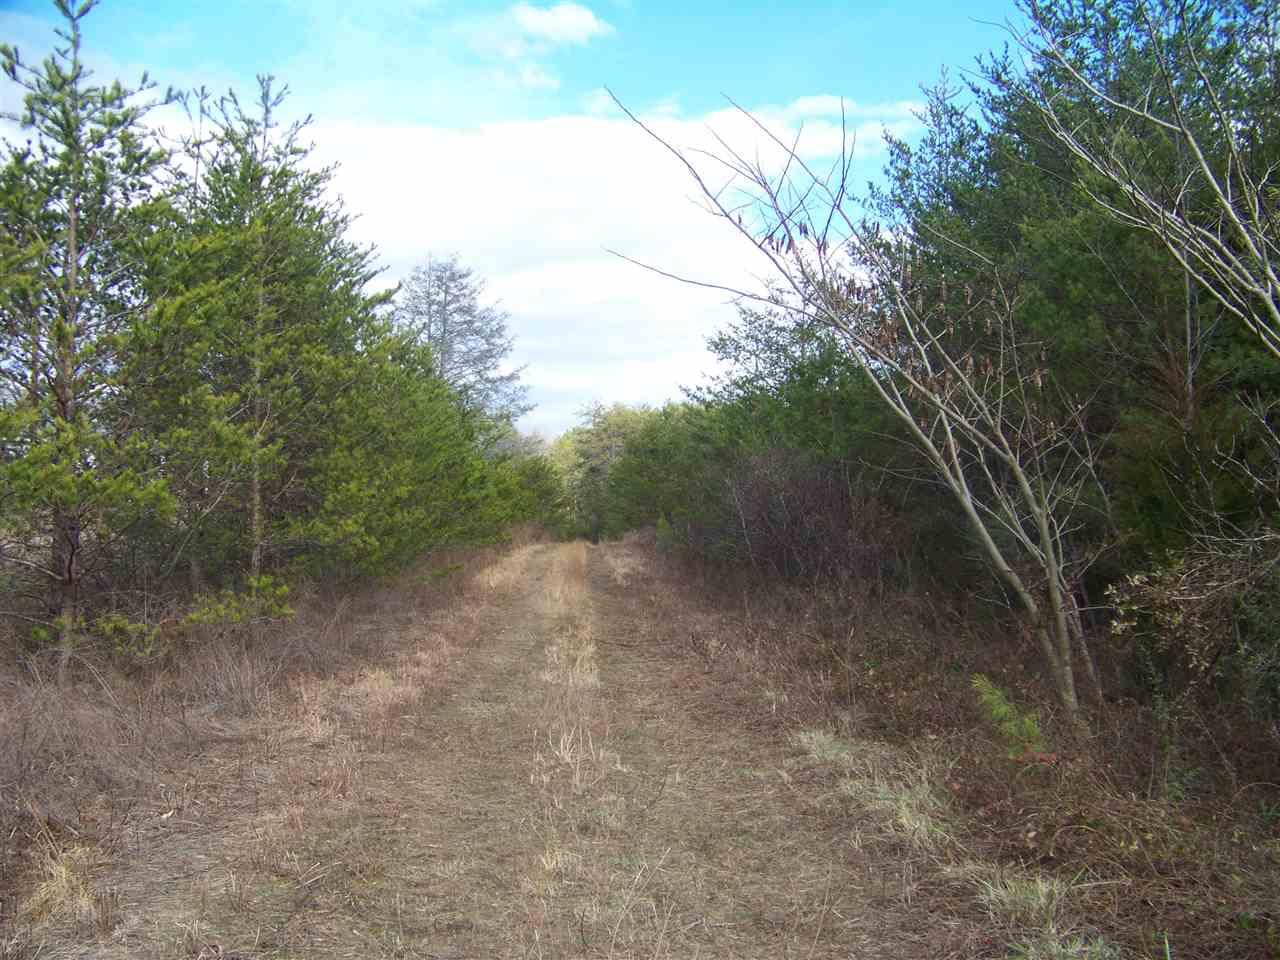 00 Pine Tree Rd, Union Mills, NC 28167